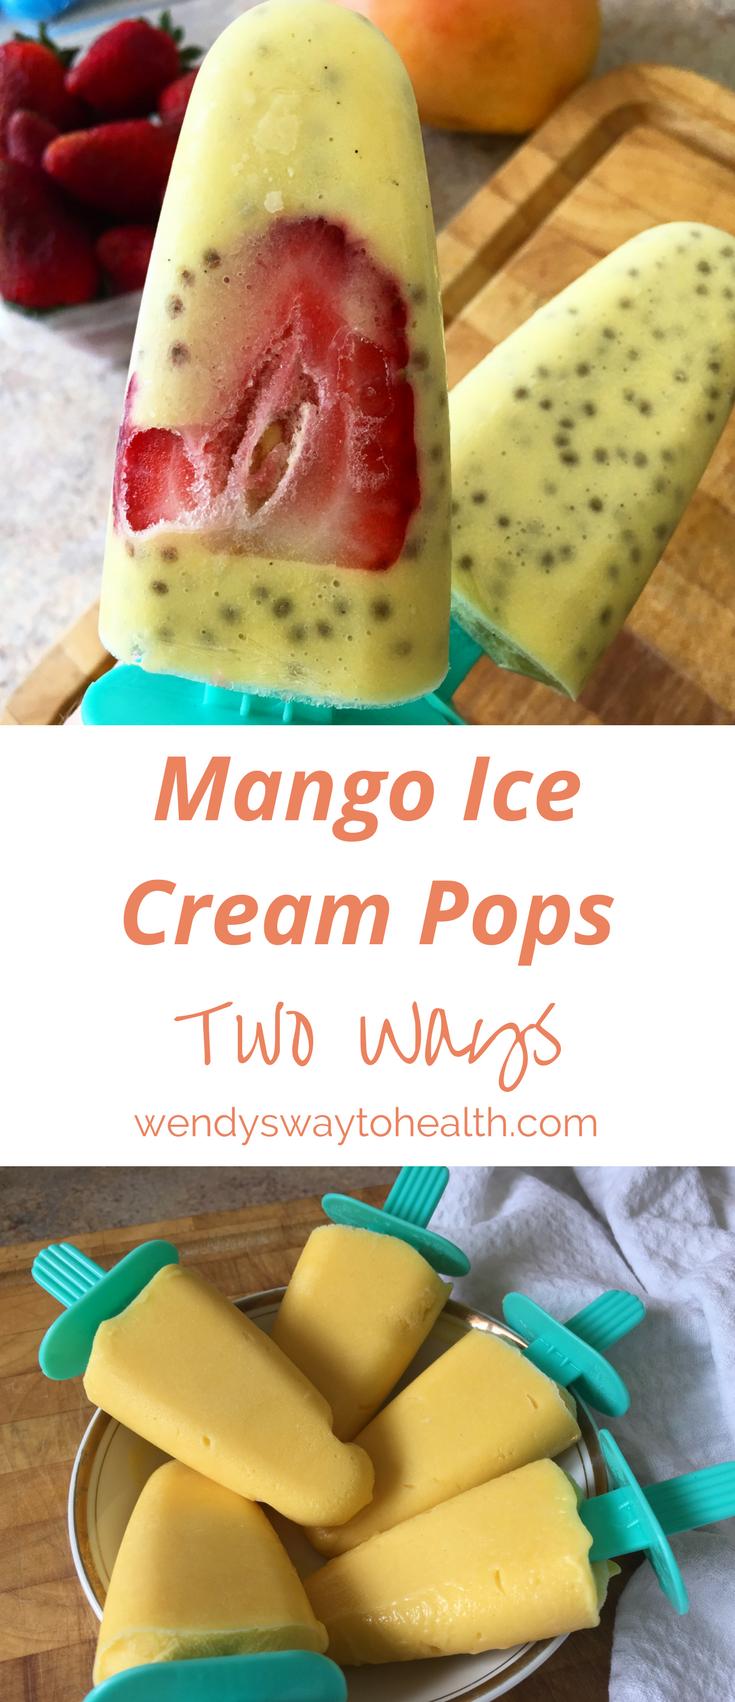 Mango Ice Cream Pops by Wendy's Way to Health